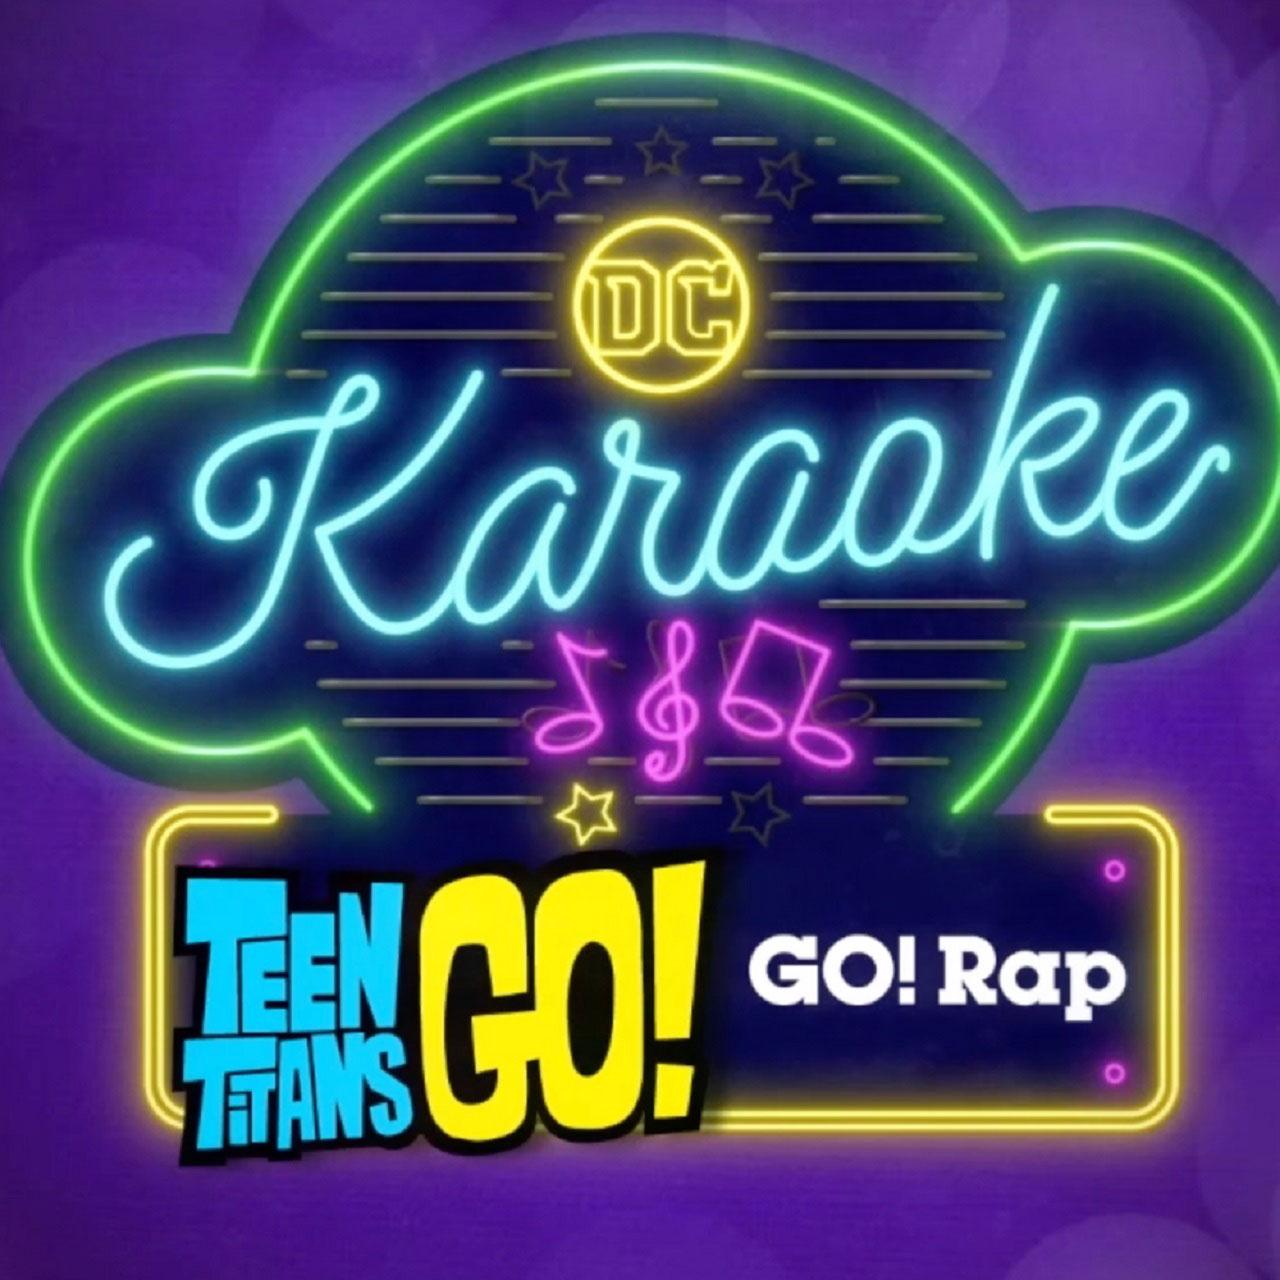 dc-fandome-karaoke.jpg